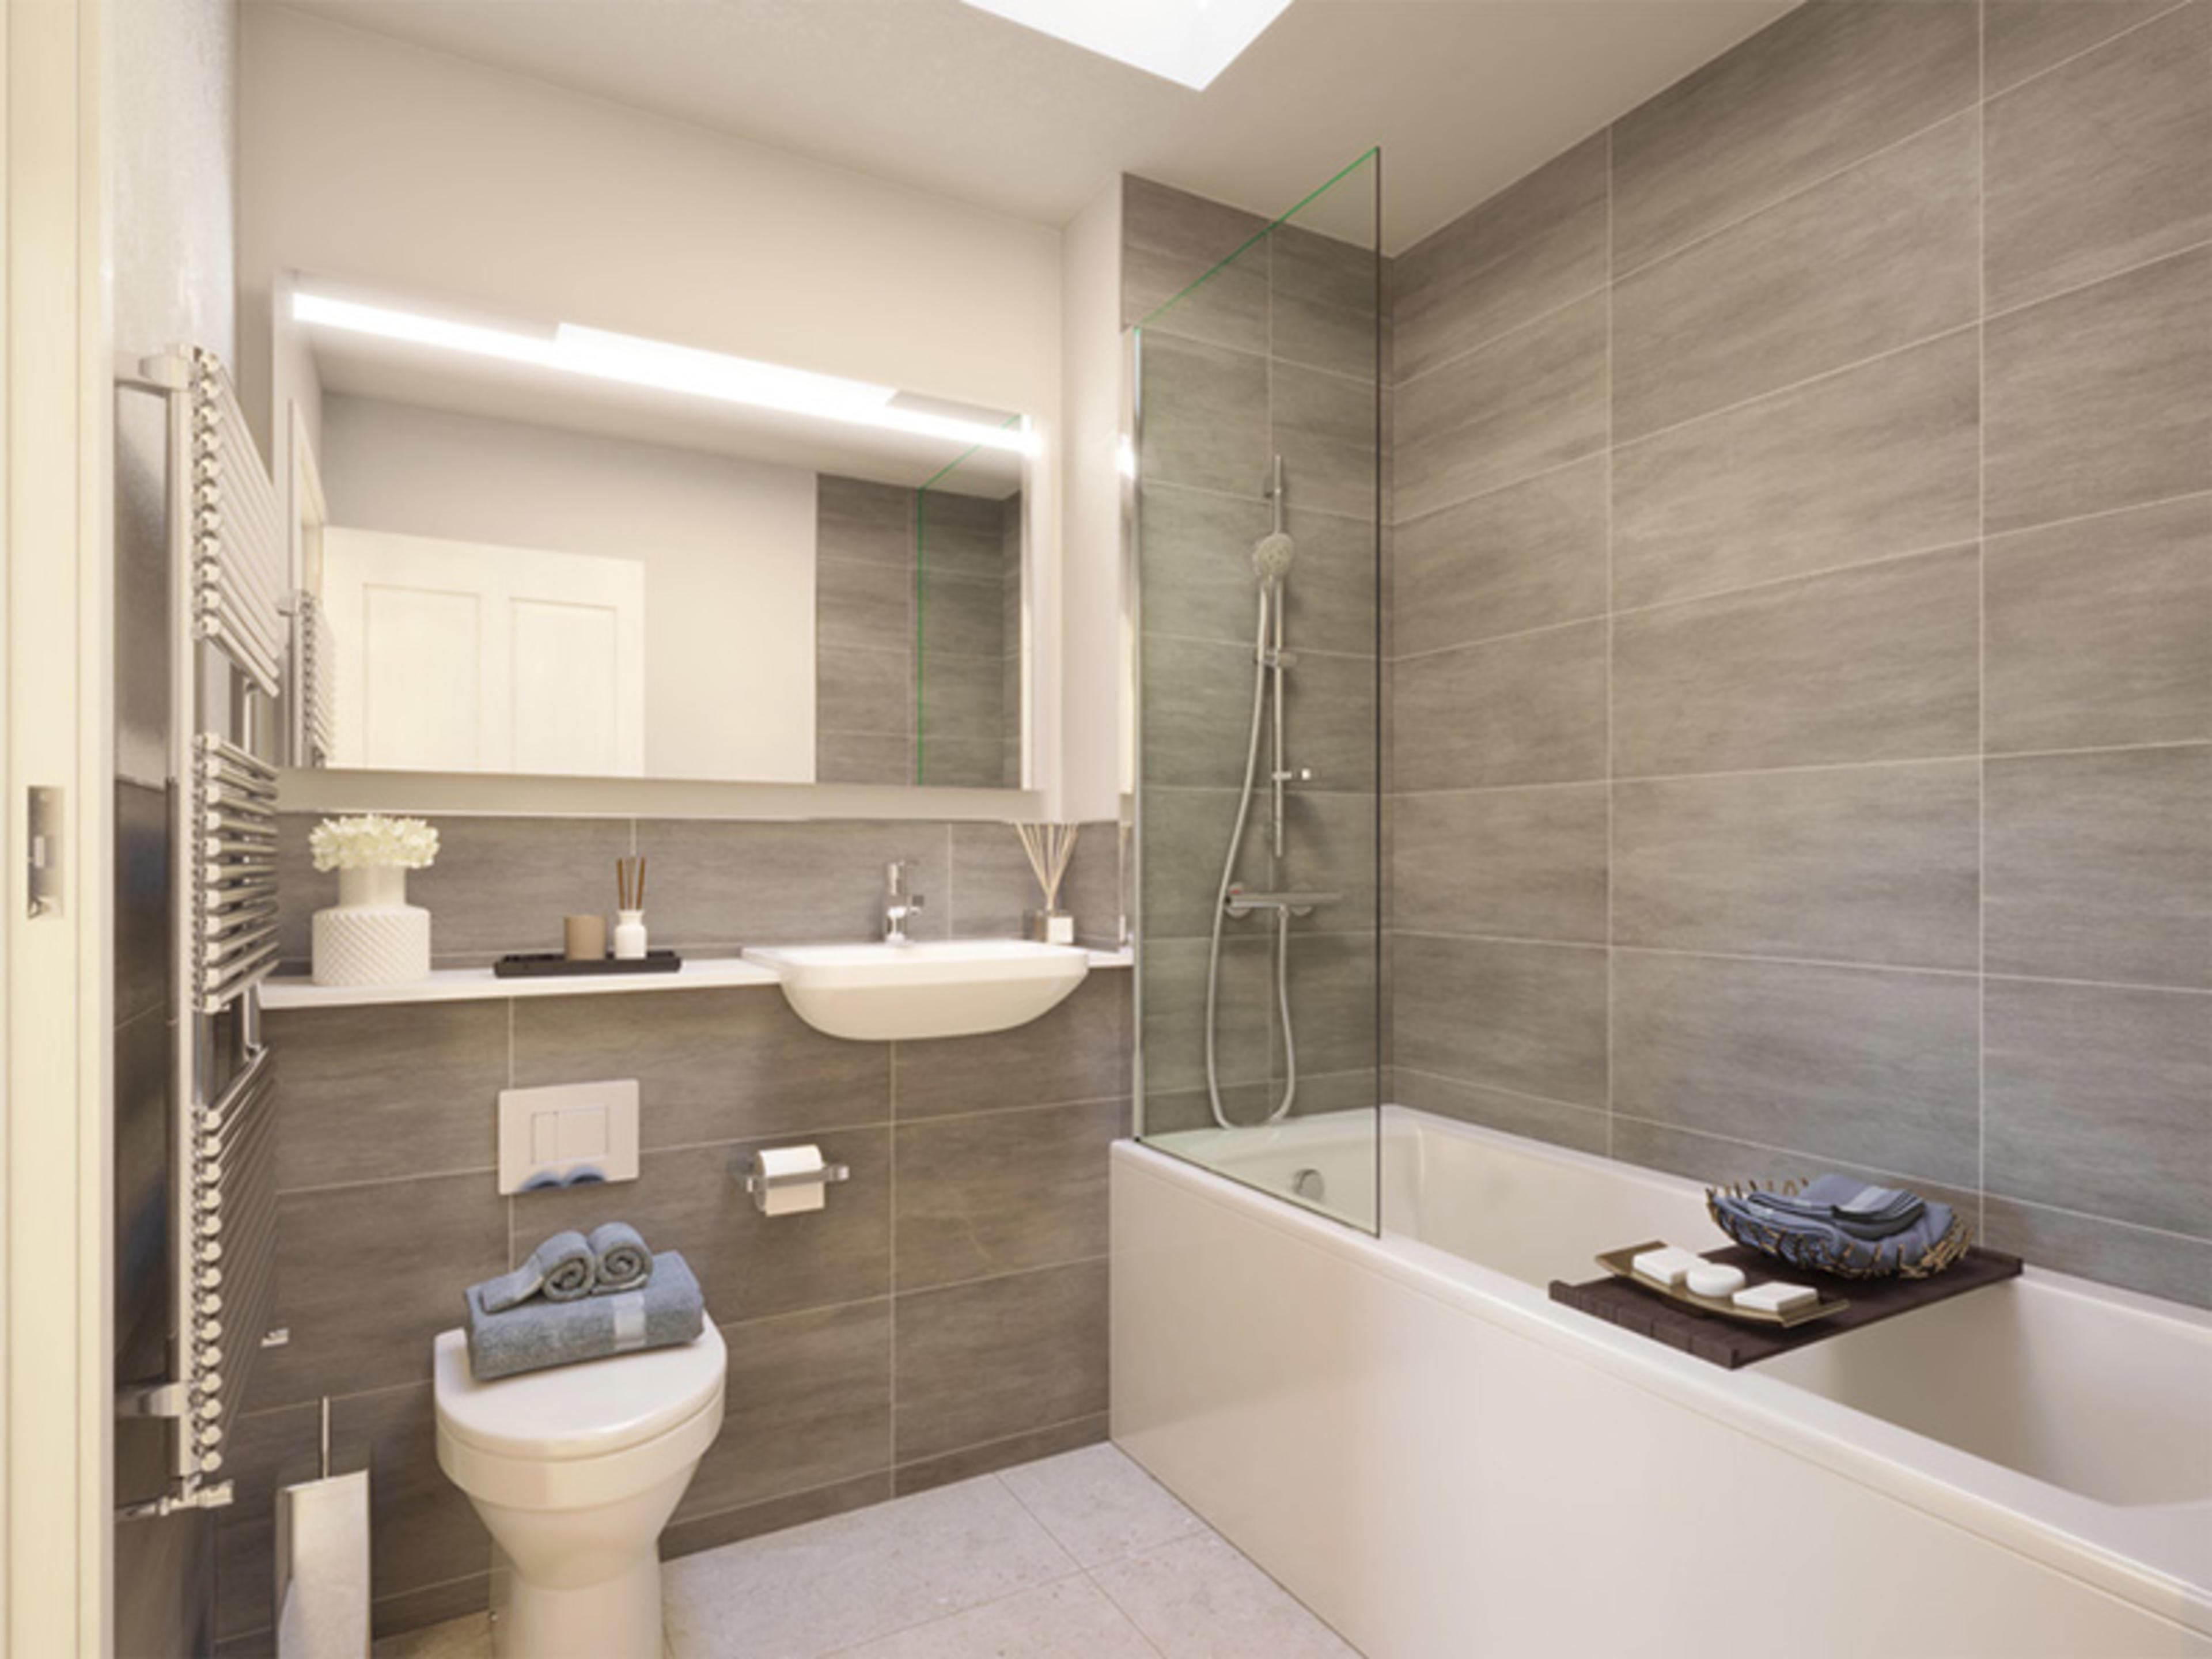 watling-grange-harrogate-kirkstead-type-q-bathroom-cgi